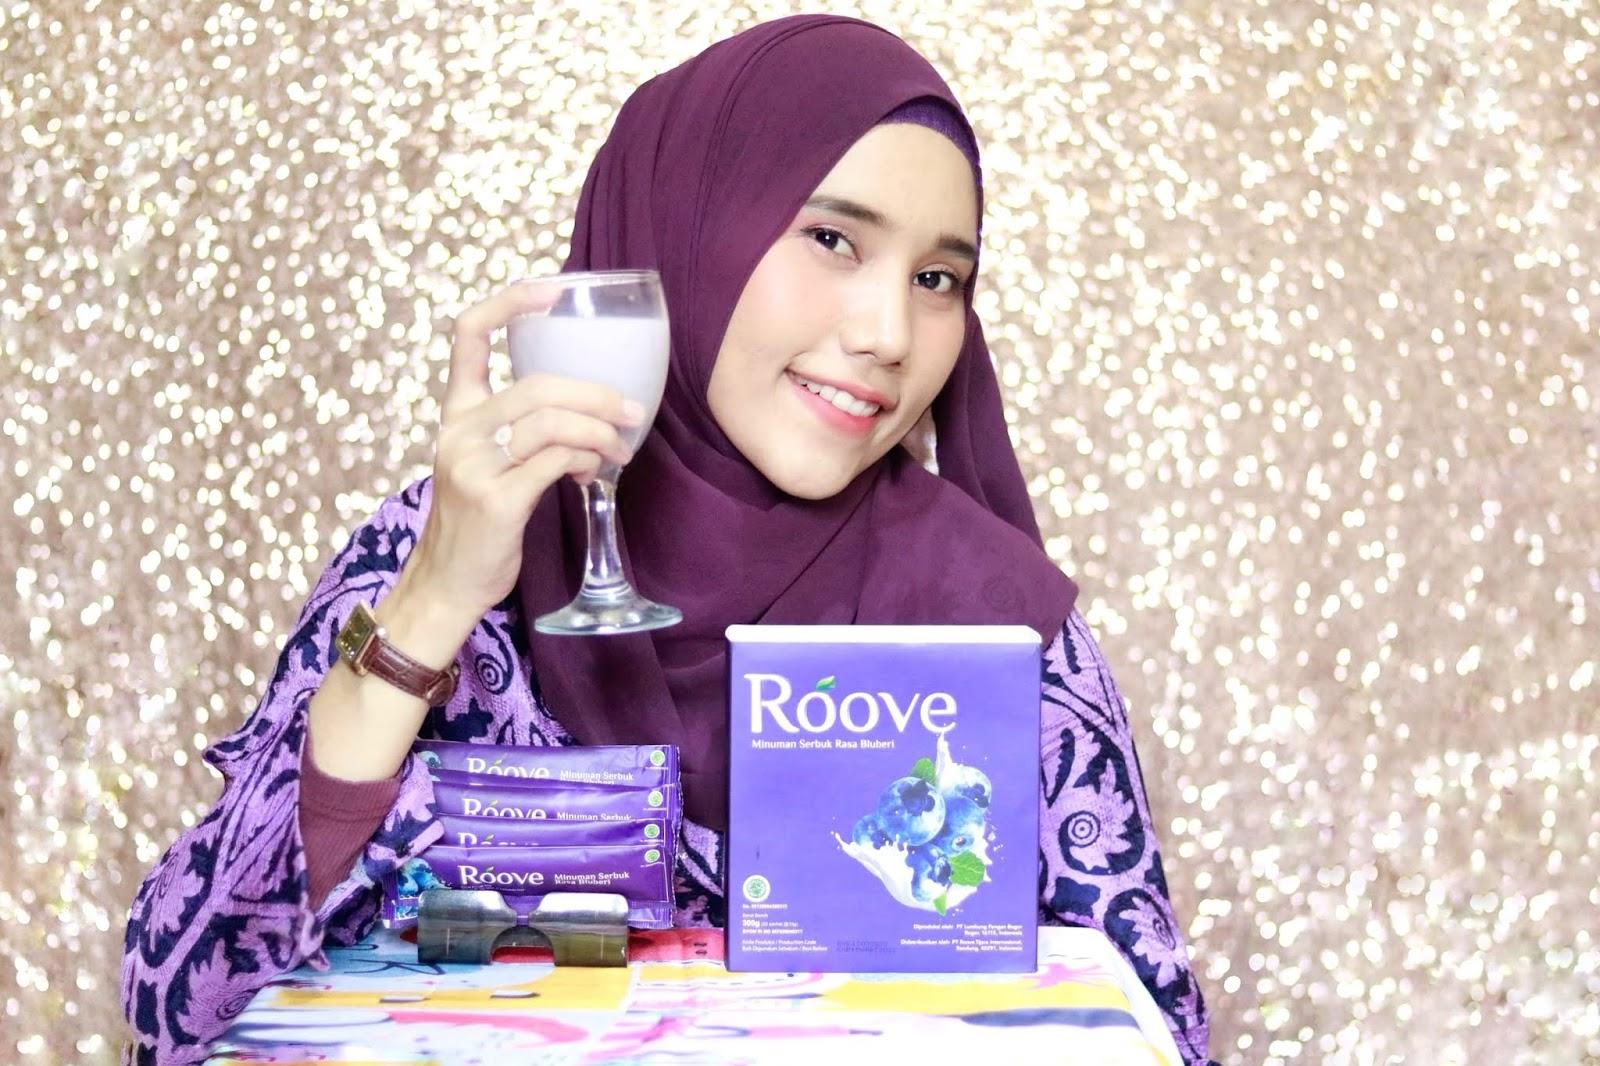 Review Roove Collagen Drink Rahasia Kulit Awet Muda Glowing Agnesiarezita Beauty Blogger Medan